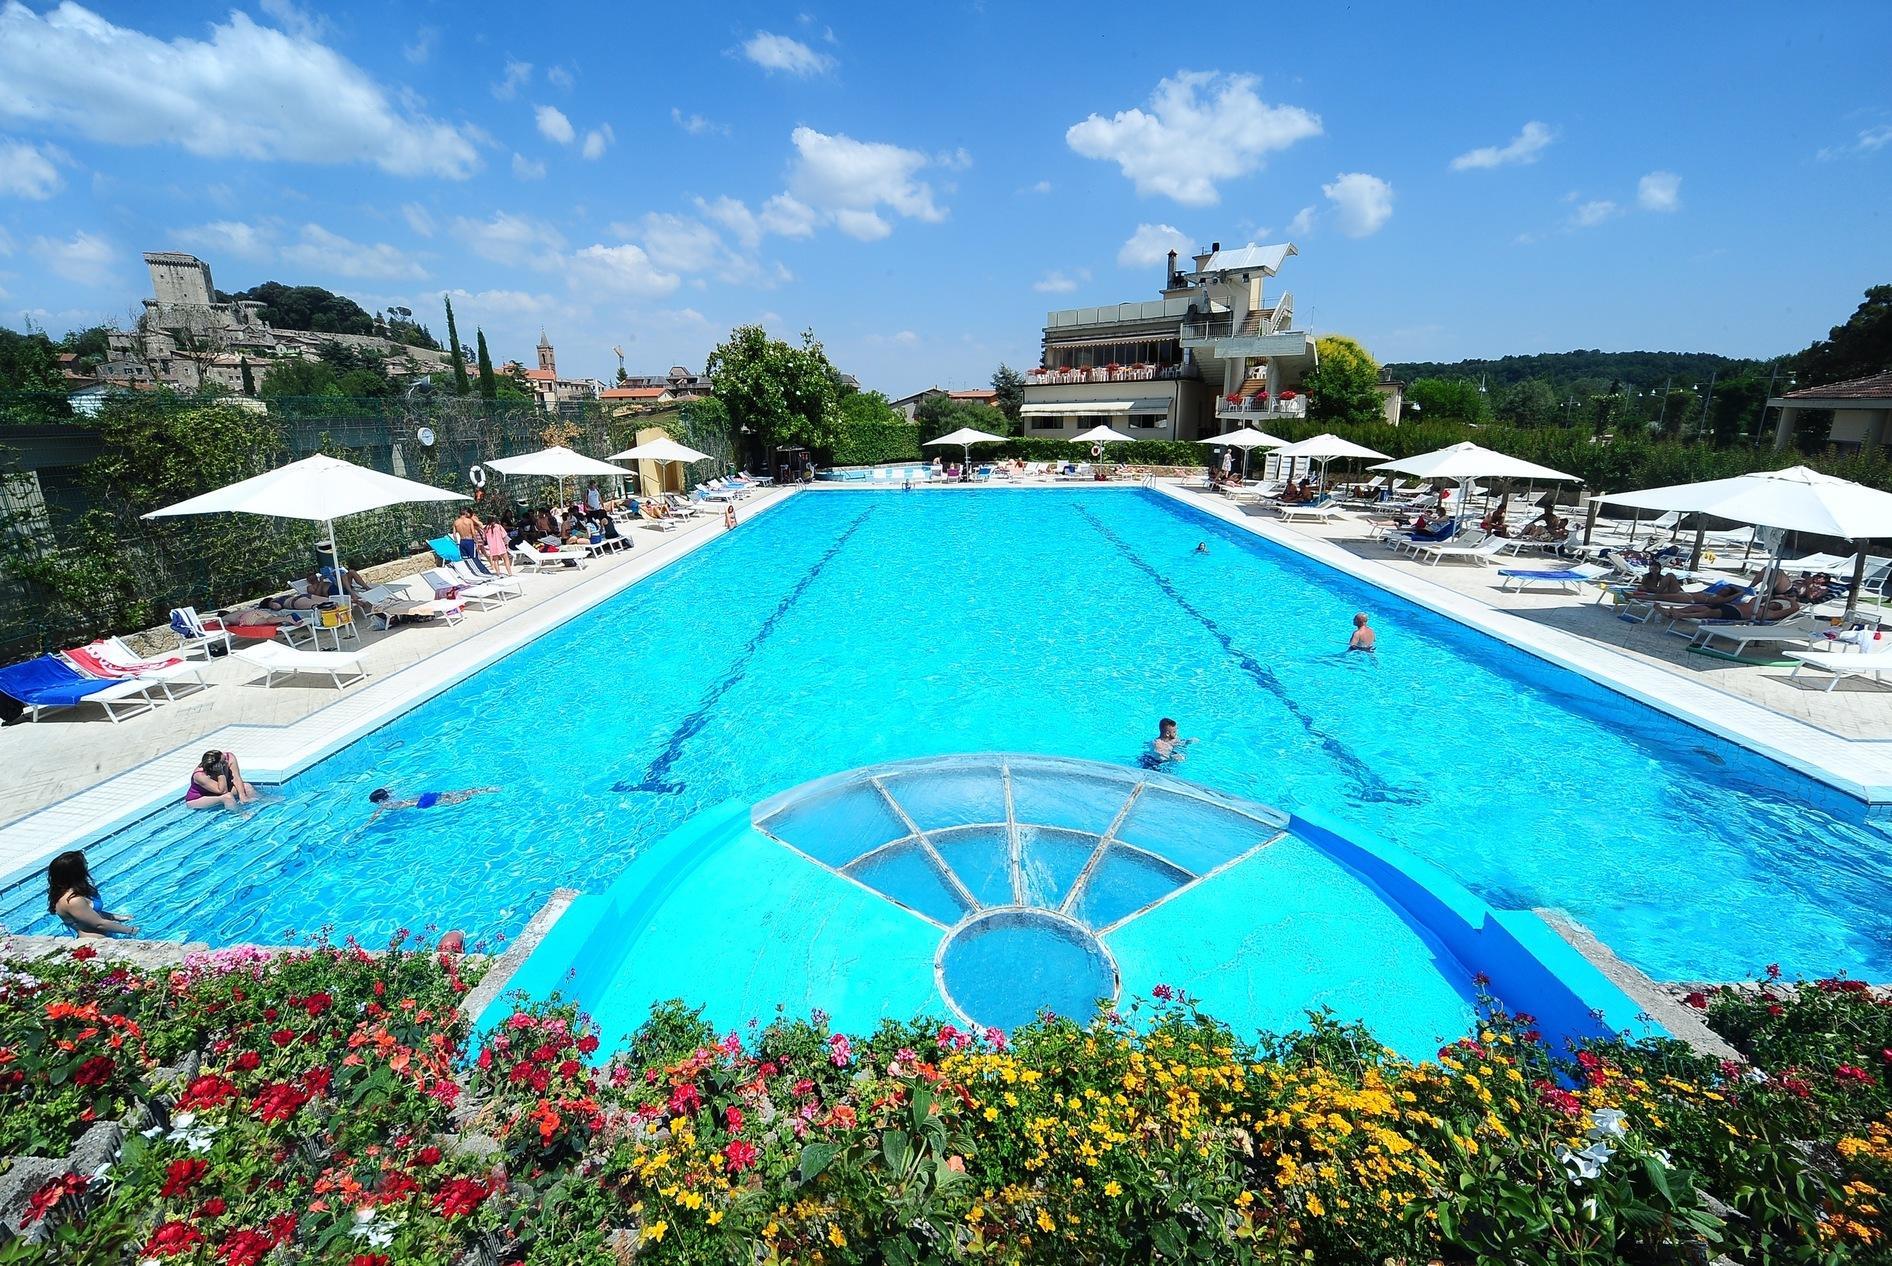 Camping village parco delle piscine toscane itali for Camping delle piscine sarteano